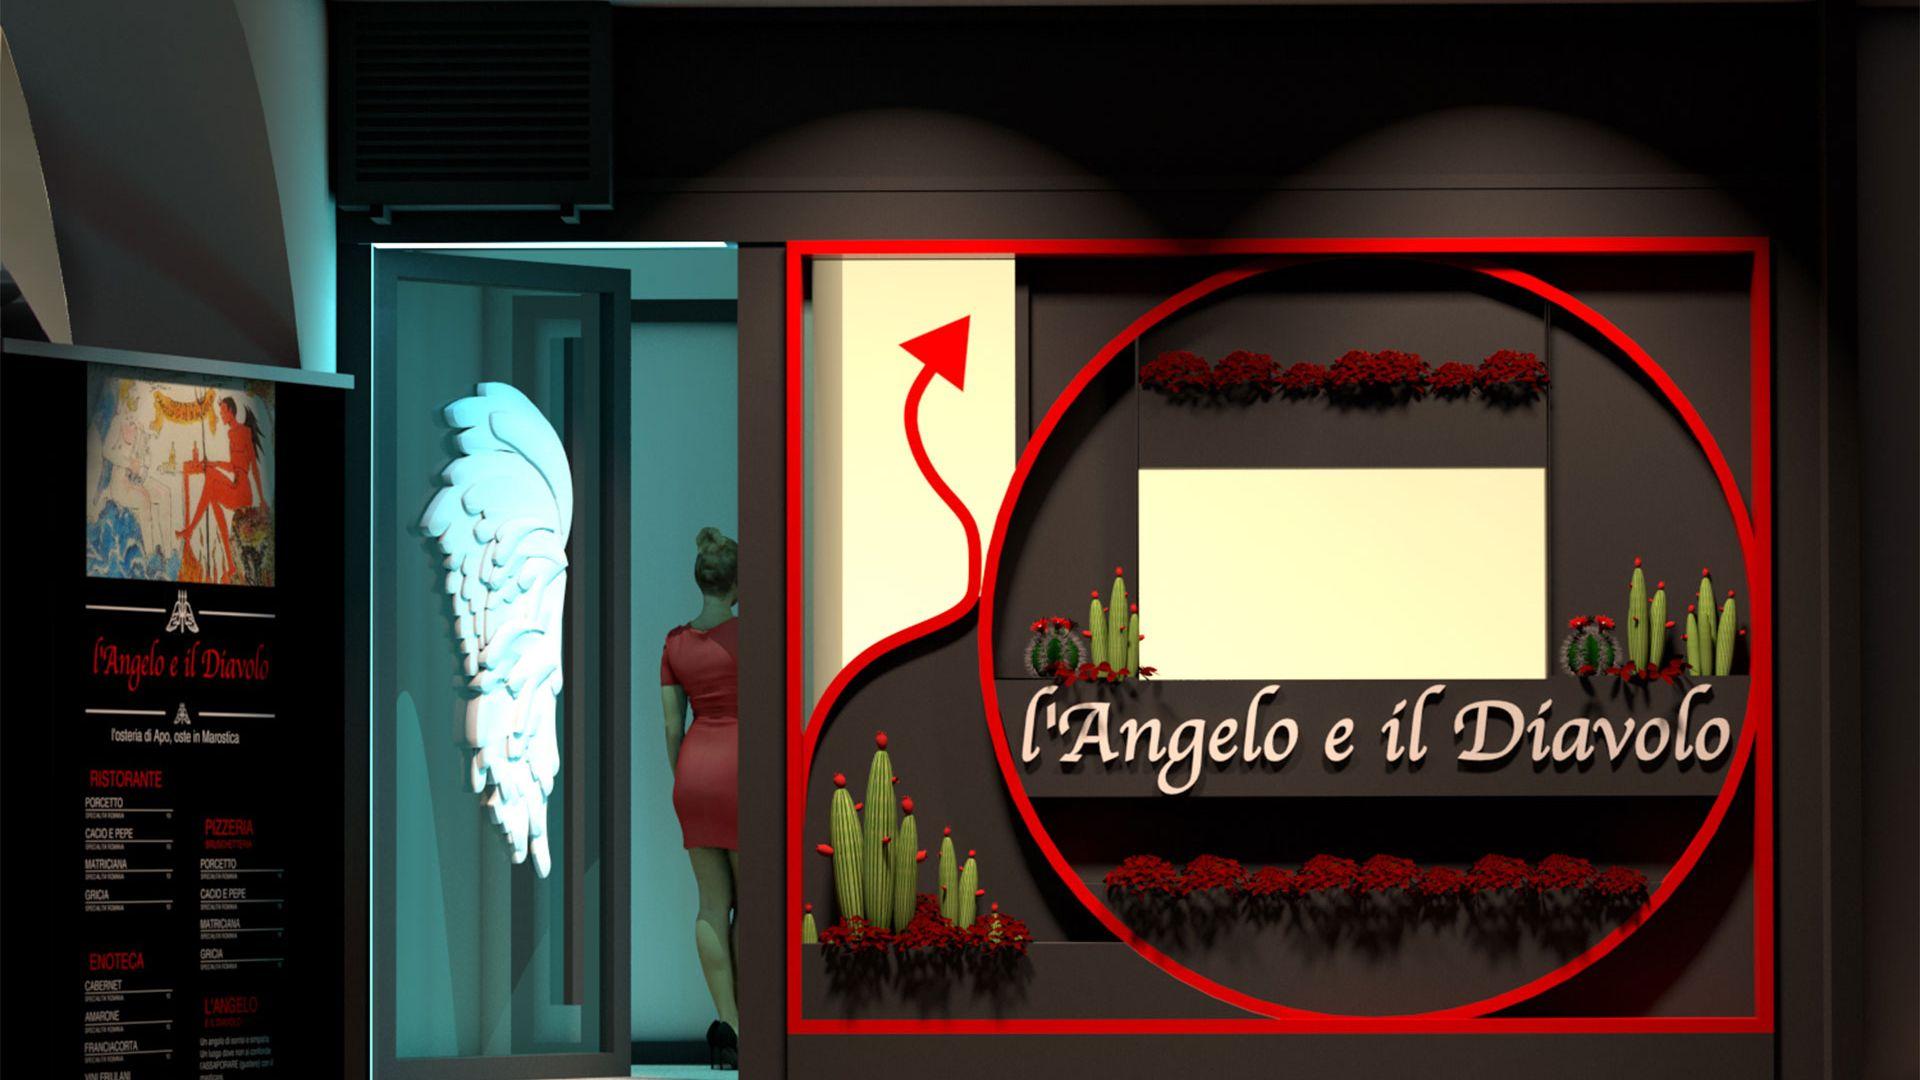 L'Angelo e il Diavolo shop entrance